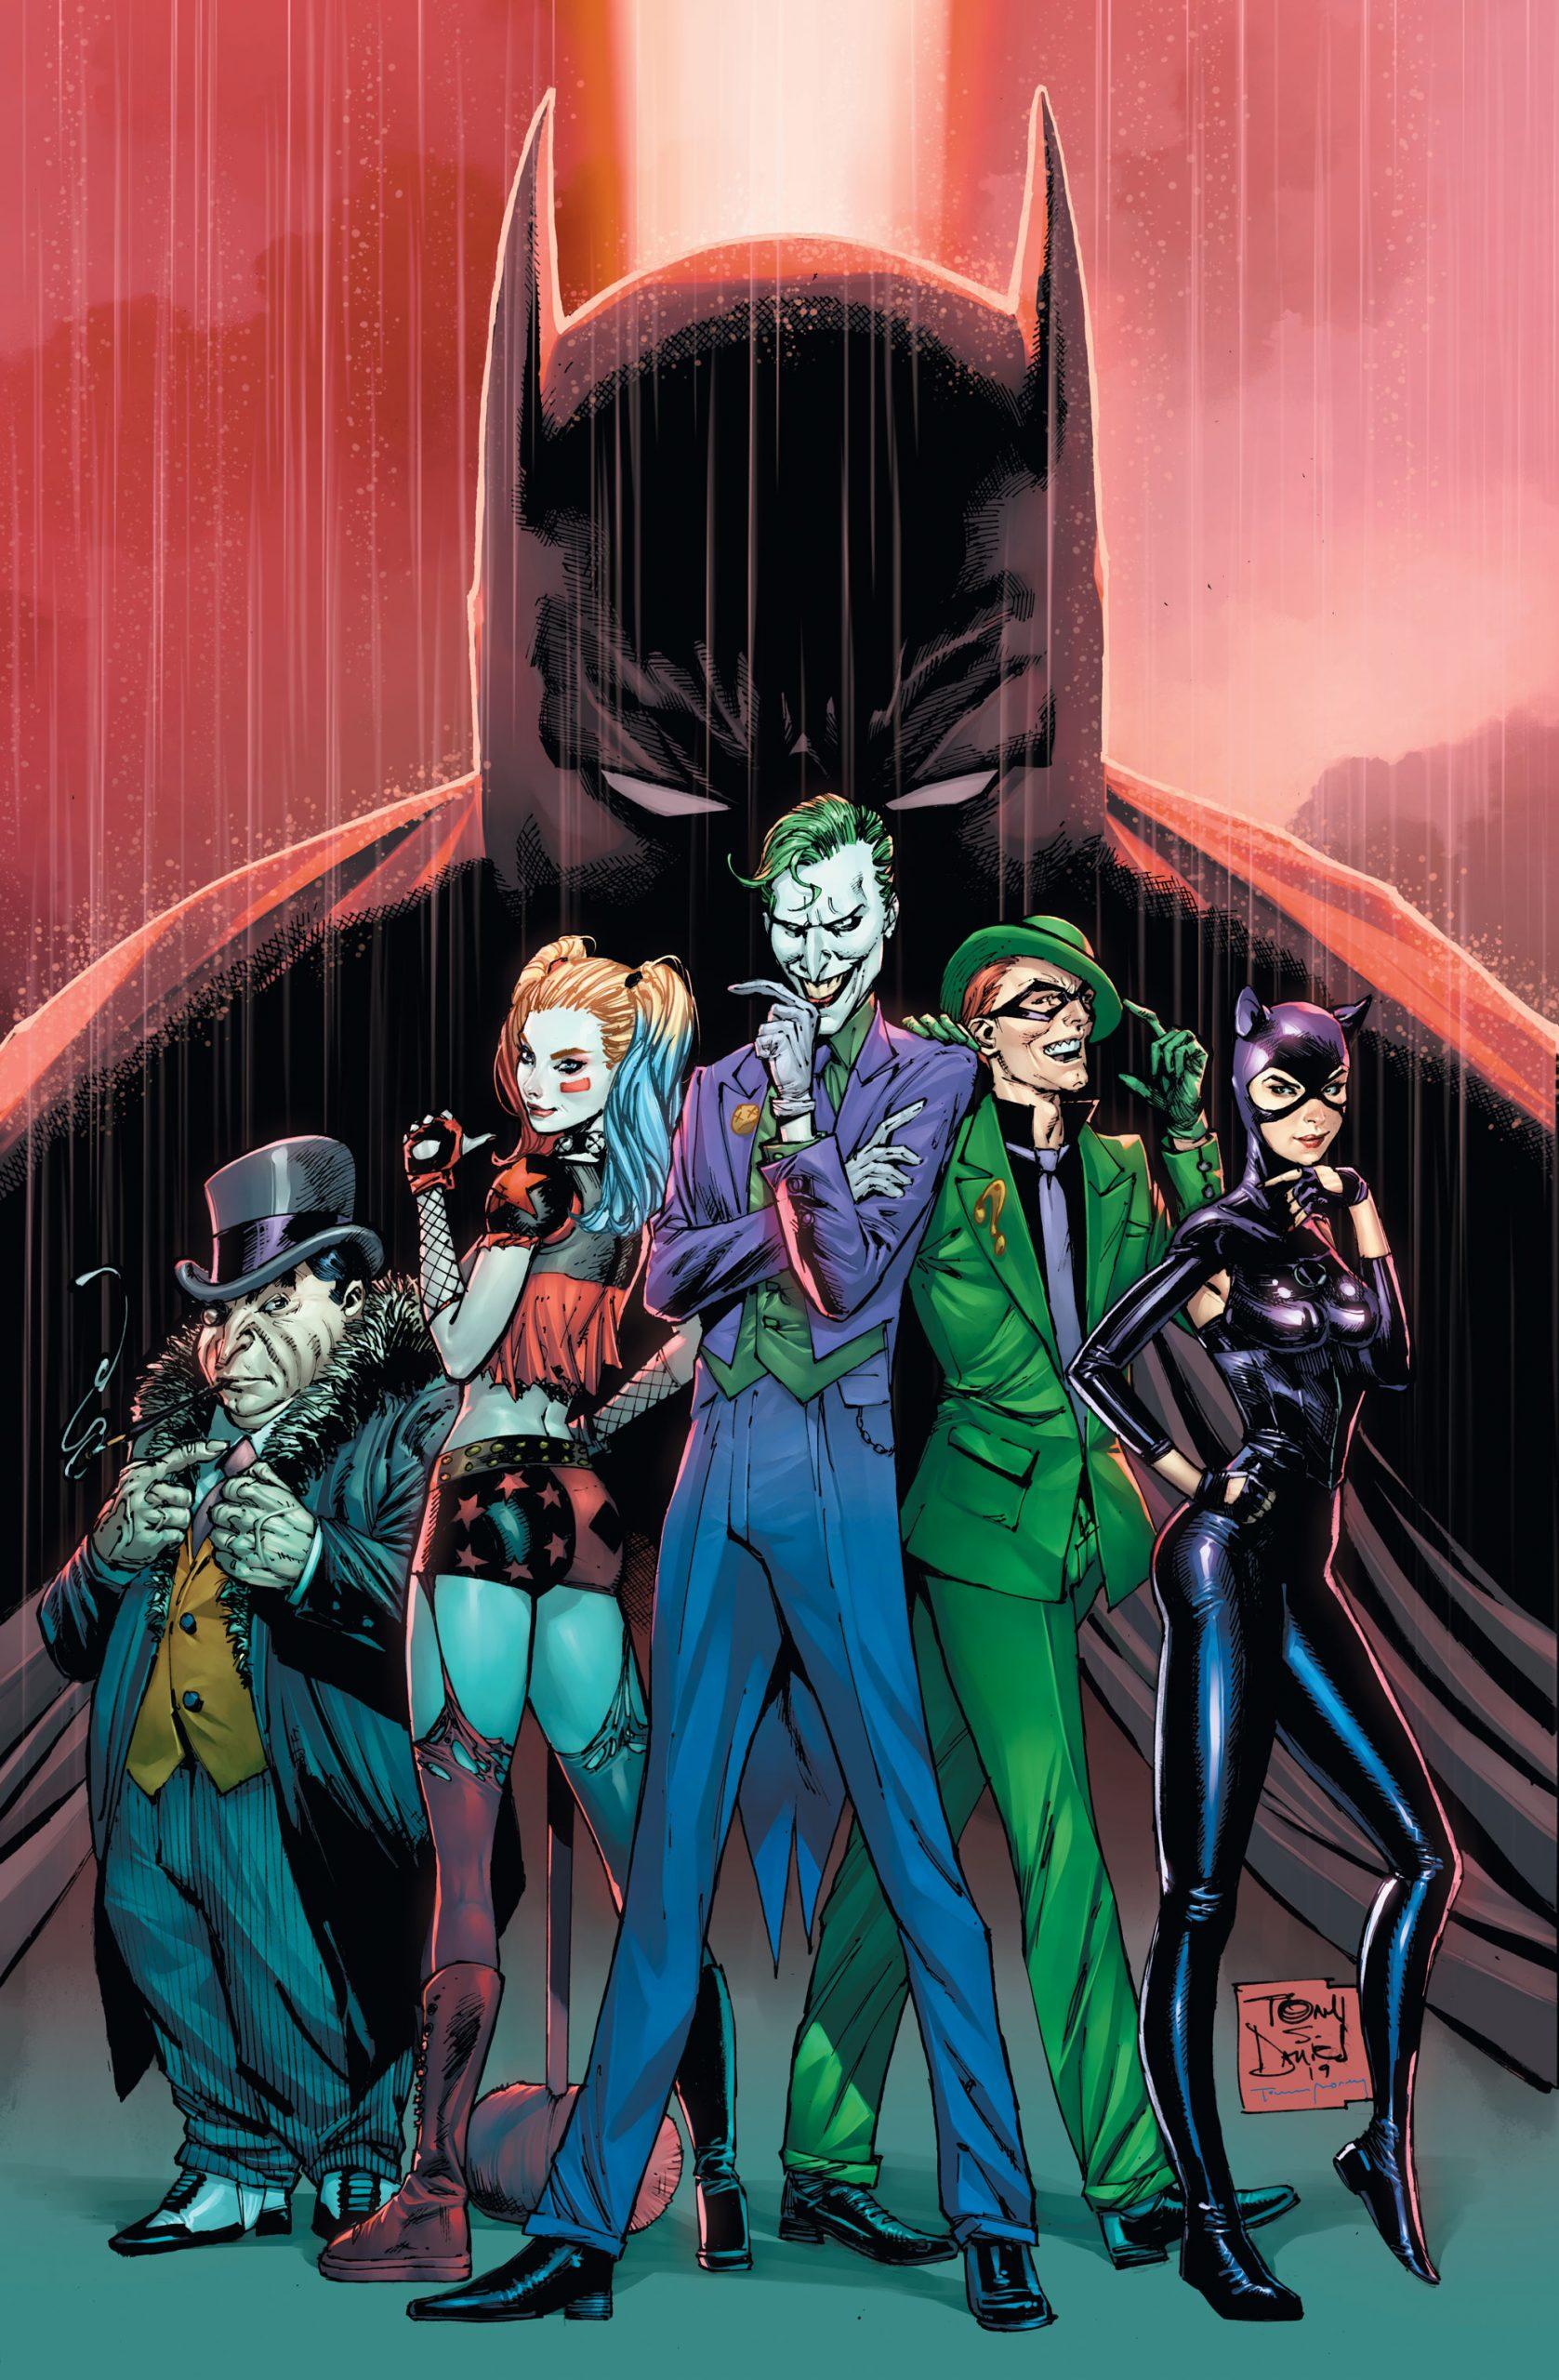 Batman #89 Cover by Tony S. Daniel